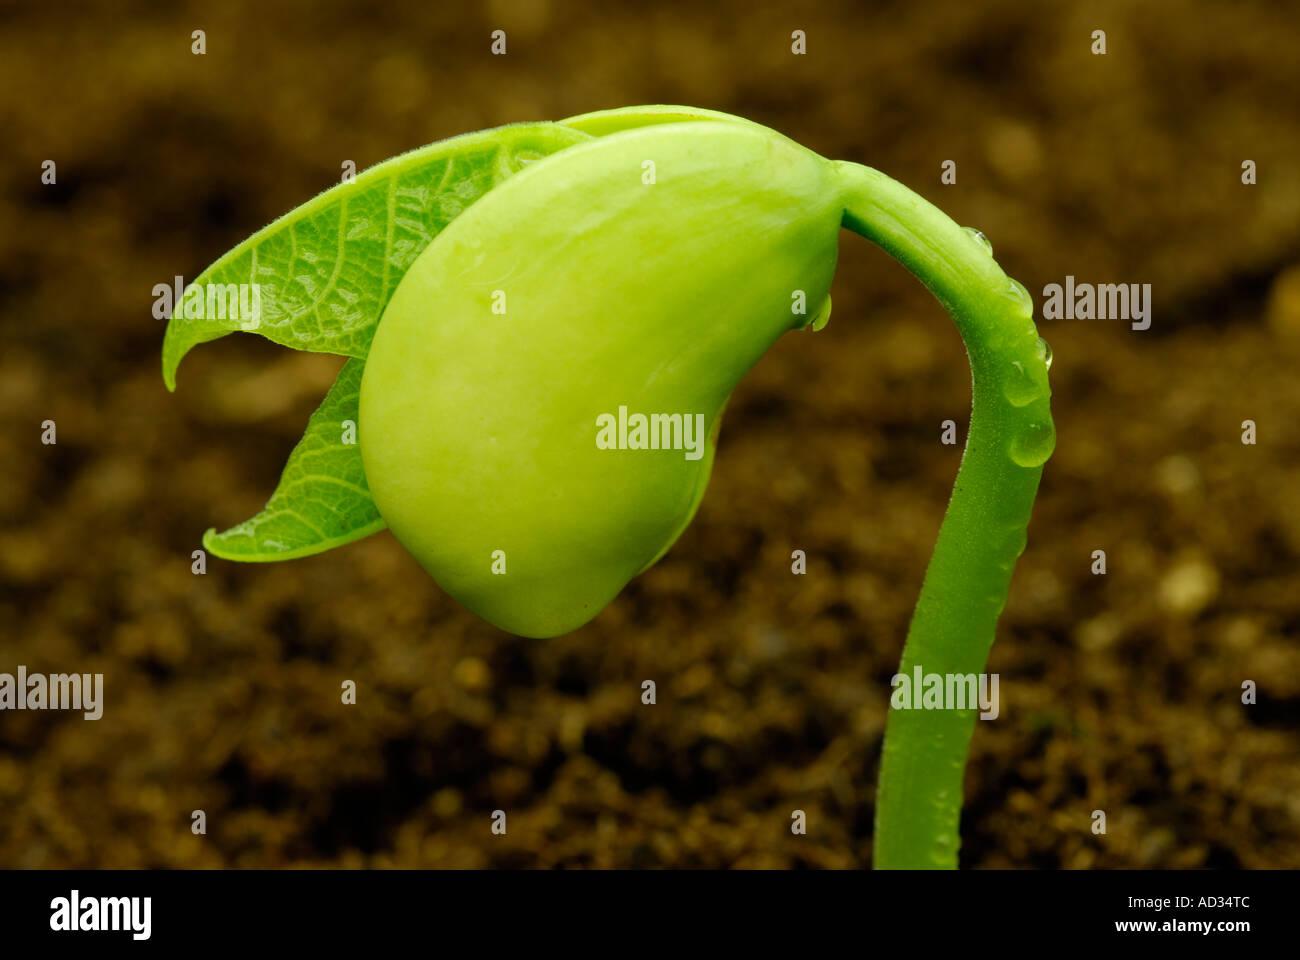 Lima bean, Phaseolus lunatus, seedling sprouting in soil - Stock Image